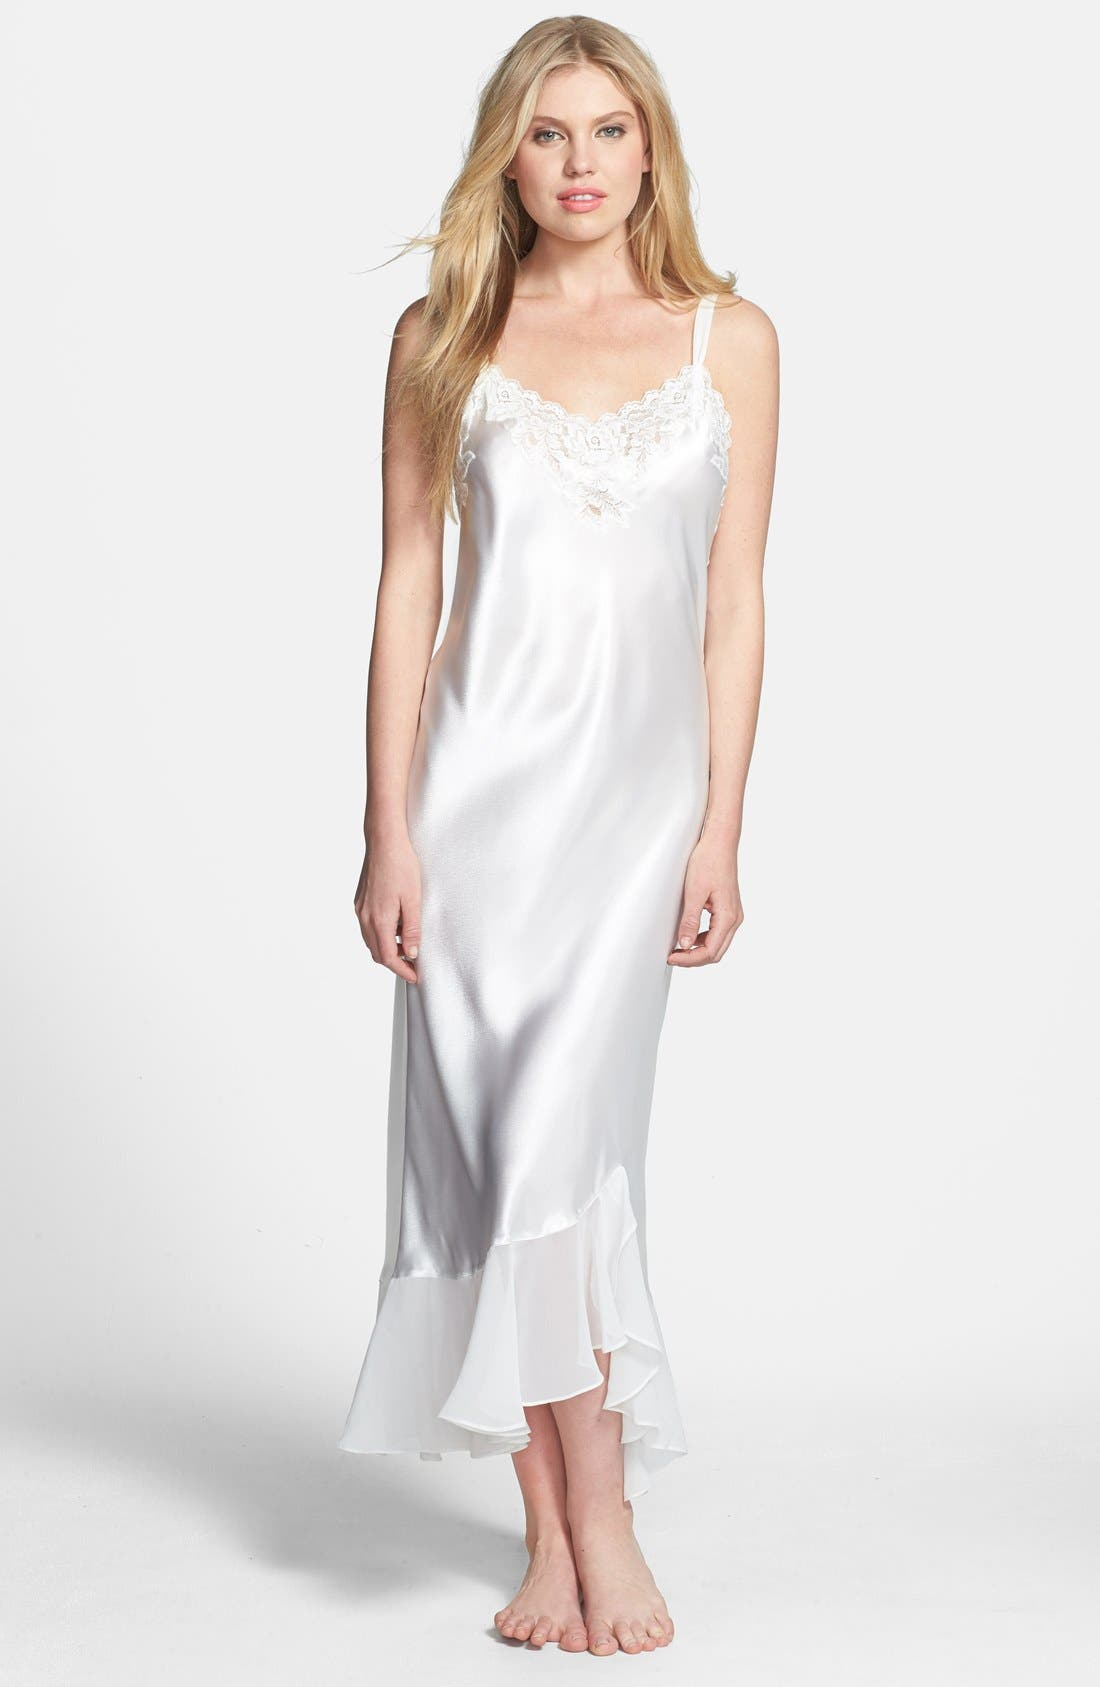 Alternate Image 1 Selected - Oscar de la Renta Sleepwear 'Evening Bliss' Satin Charmeuse Nightgown